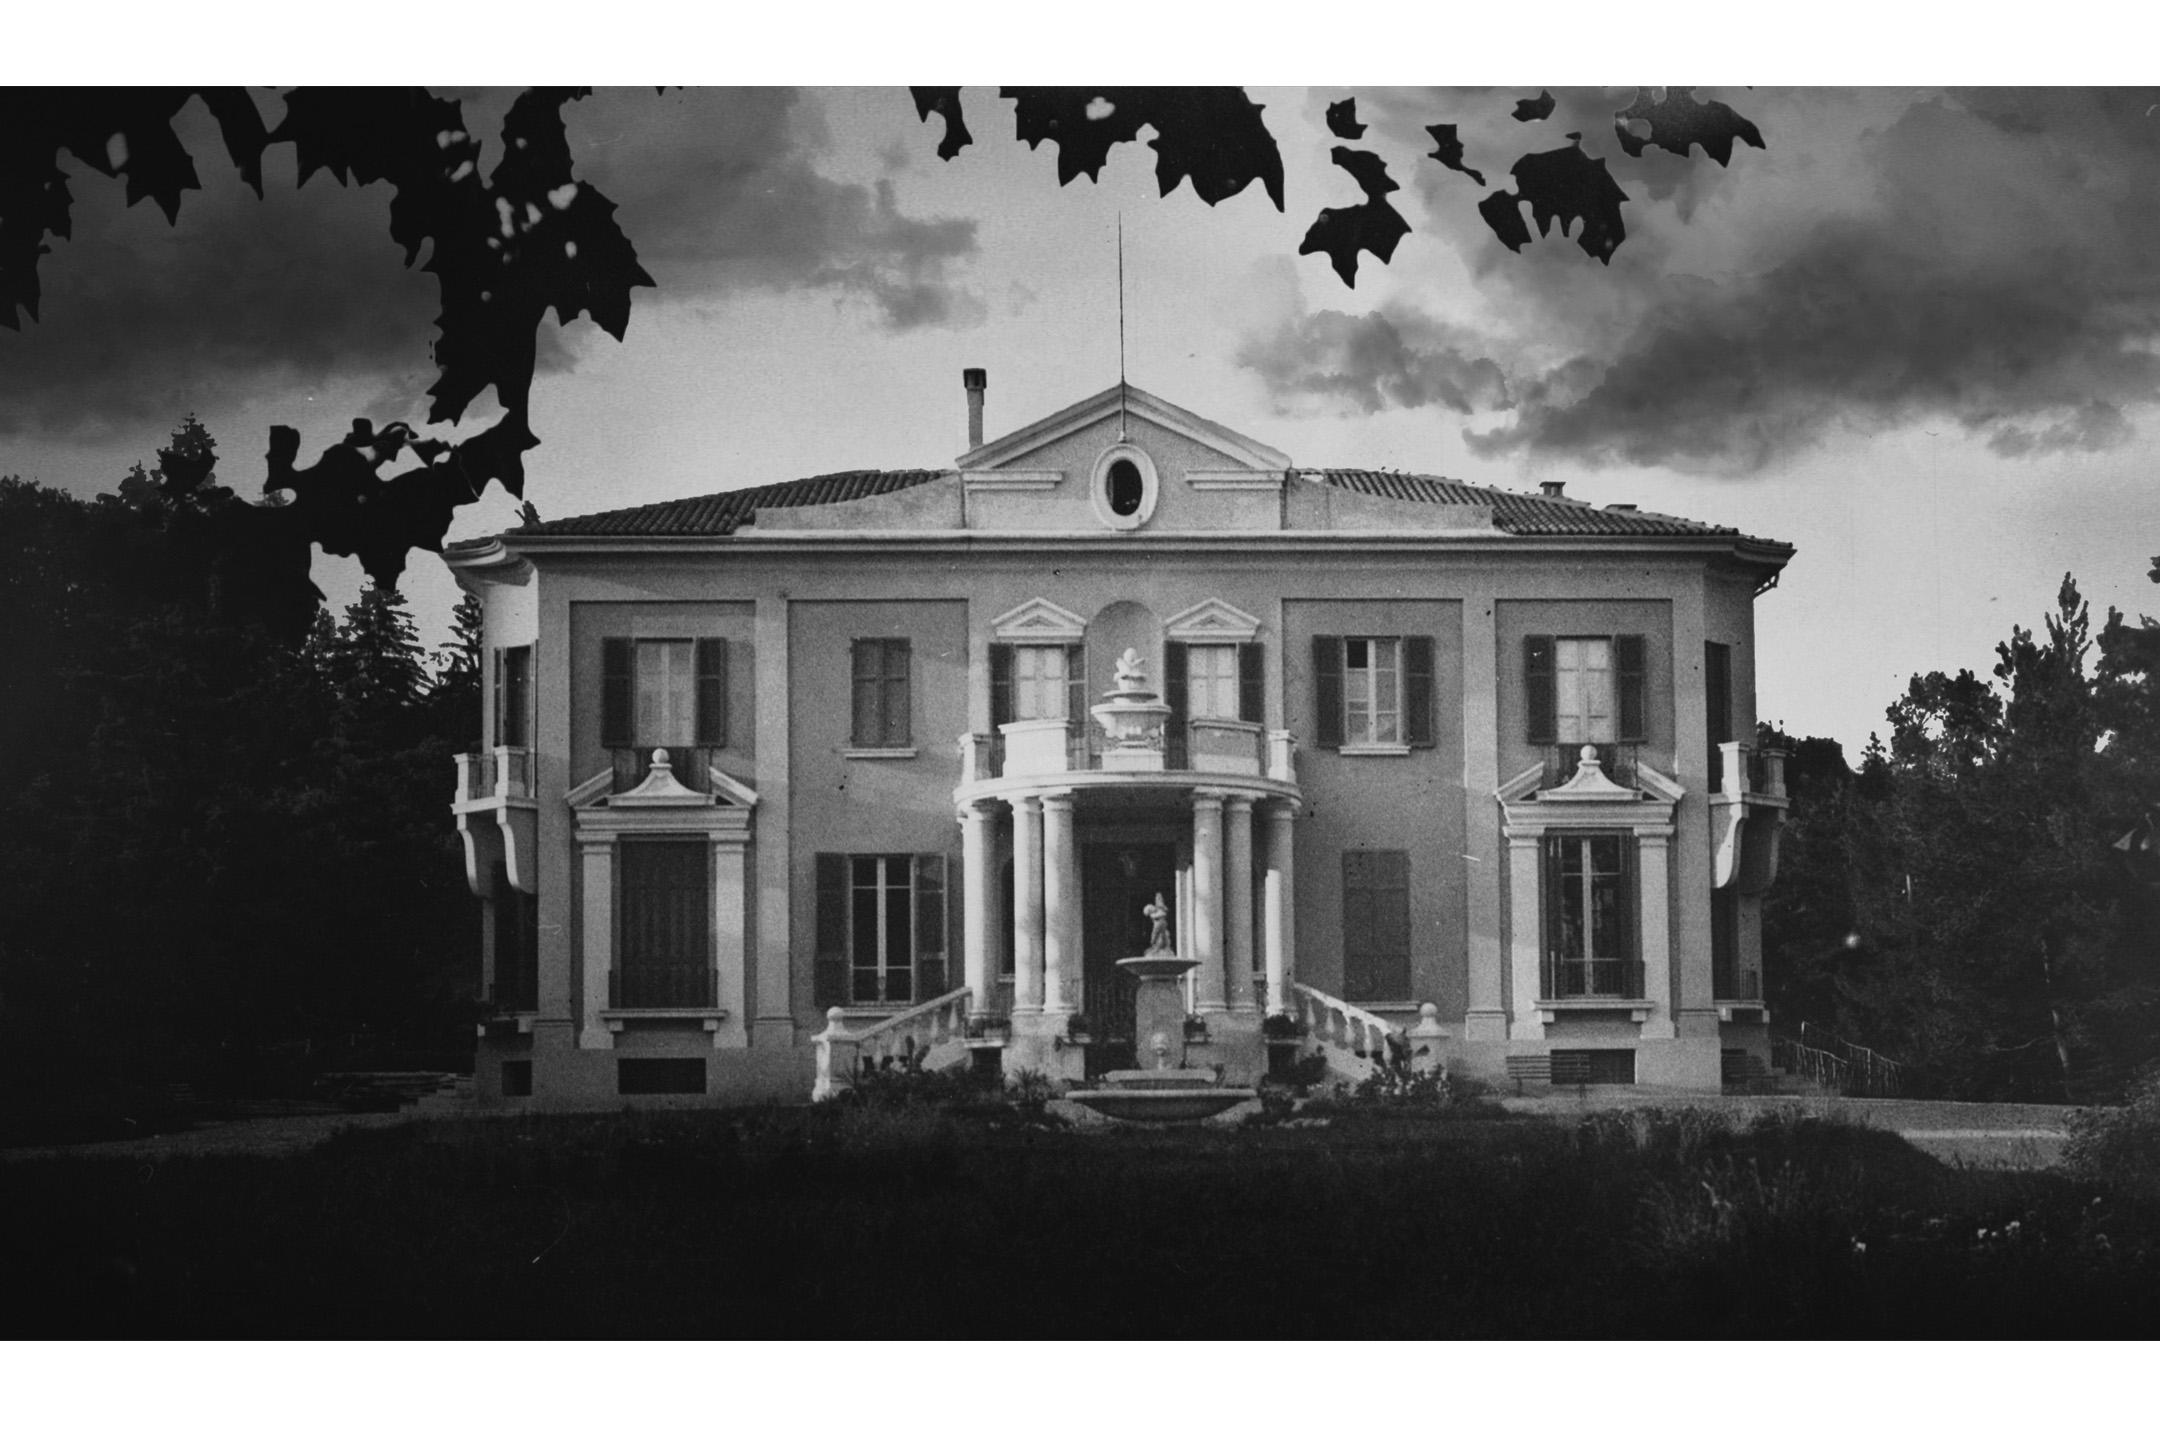 Amati fantasmi - Casa Borelli